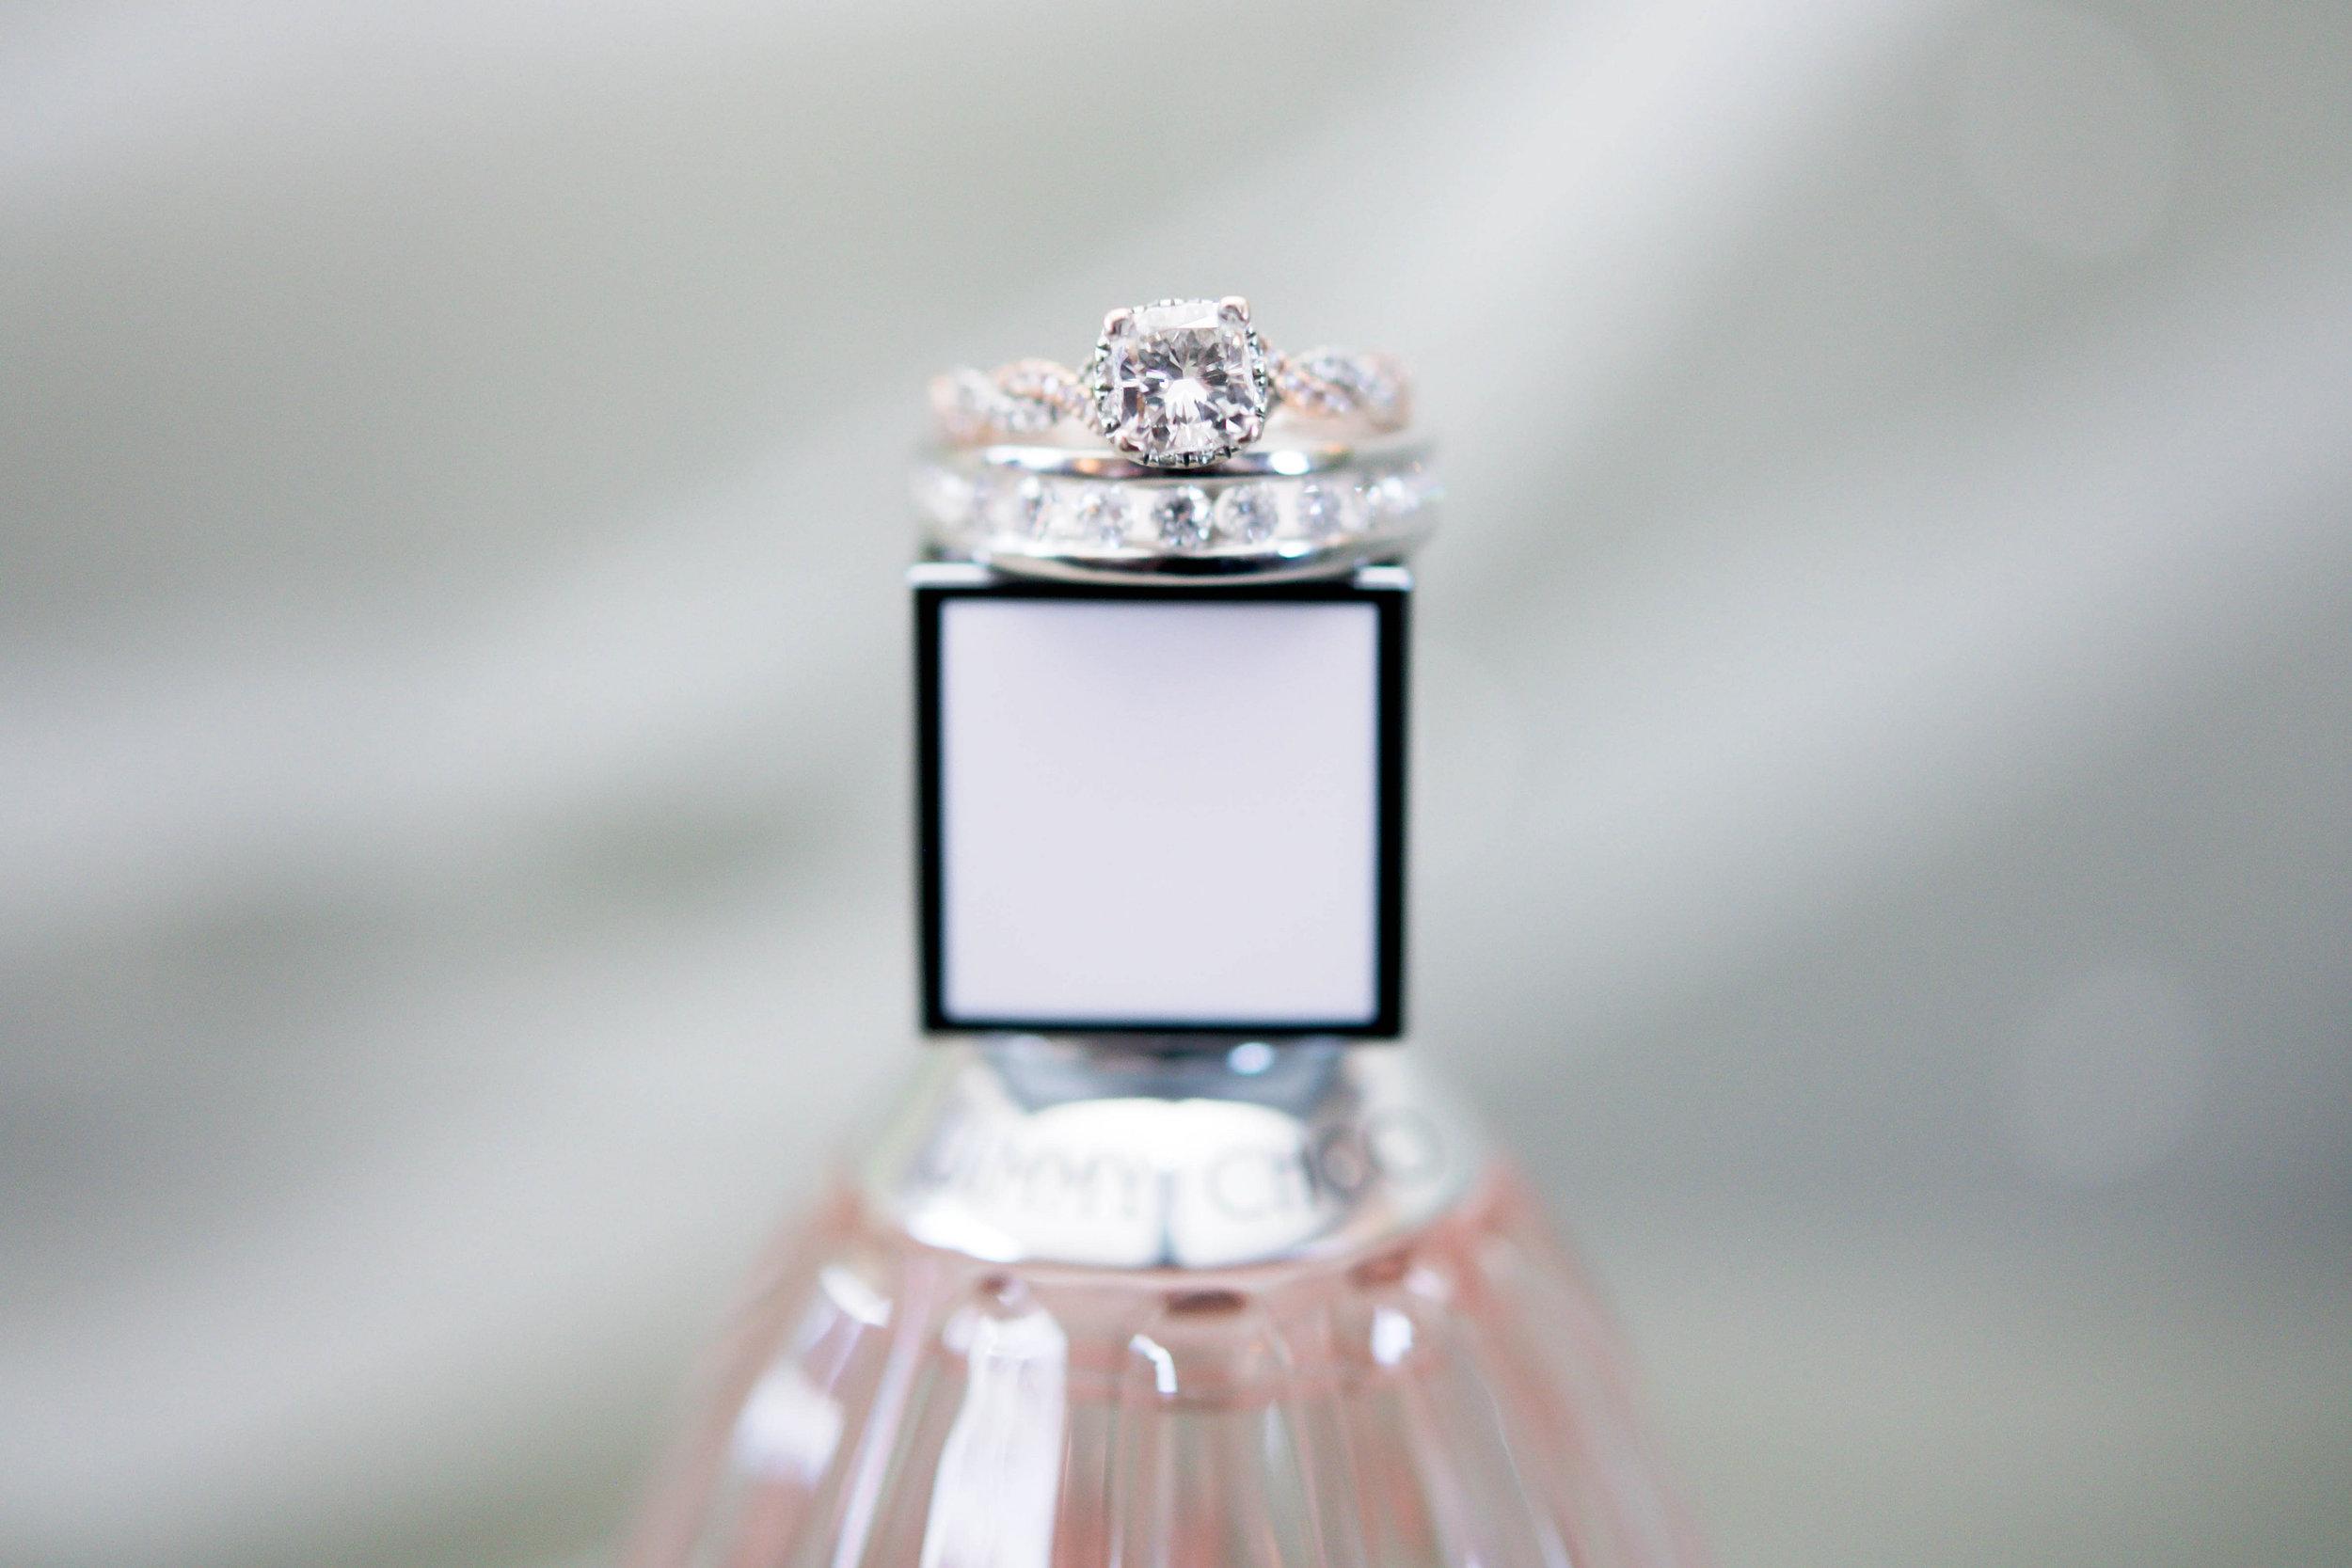 Houston Wedding- Pharris Photography- Nicole + Mike- Wedding Details- Perfume Bottle- Wedding Rings